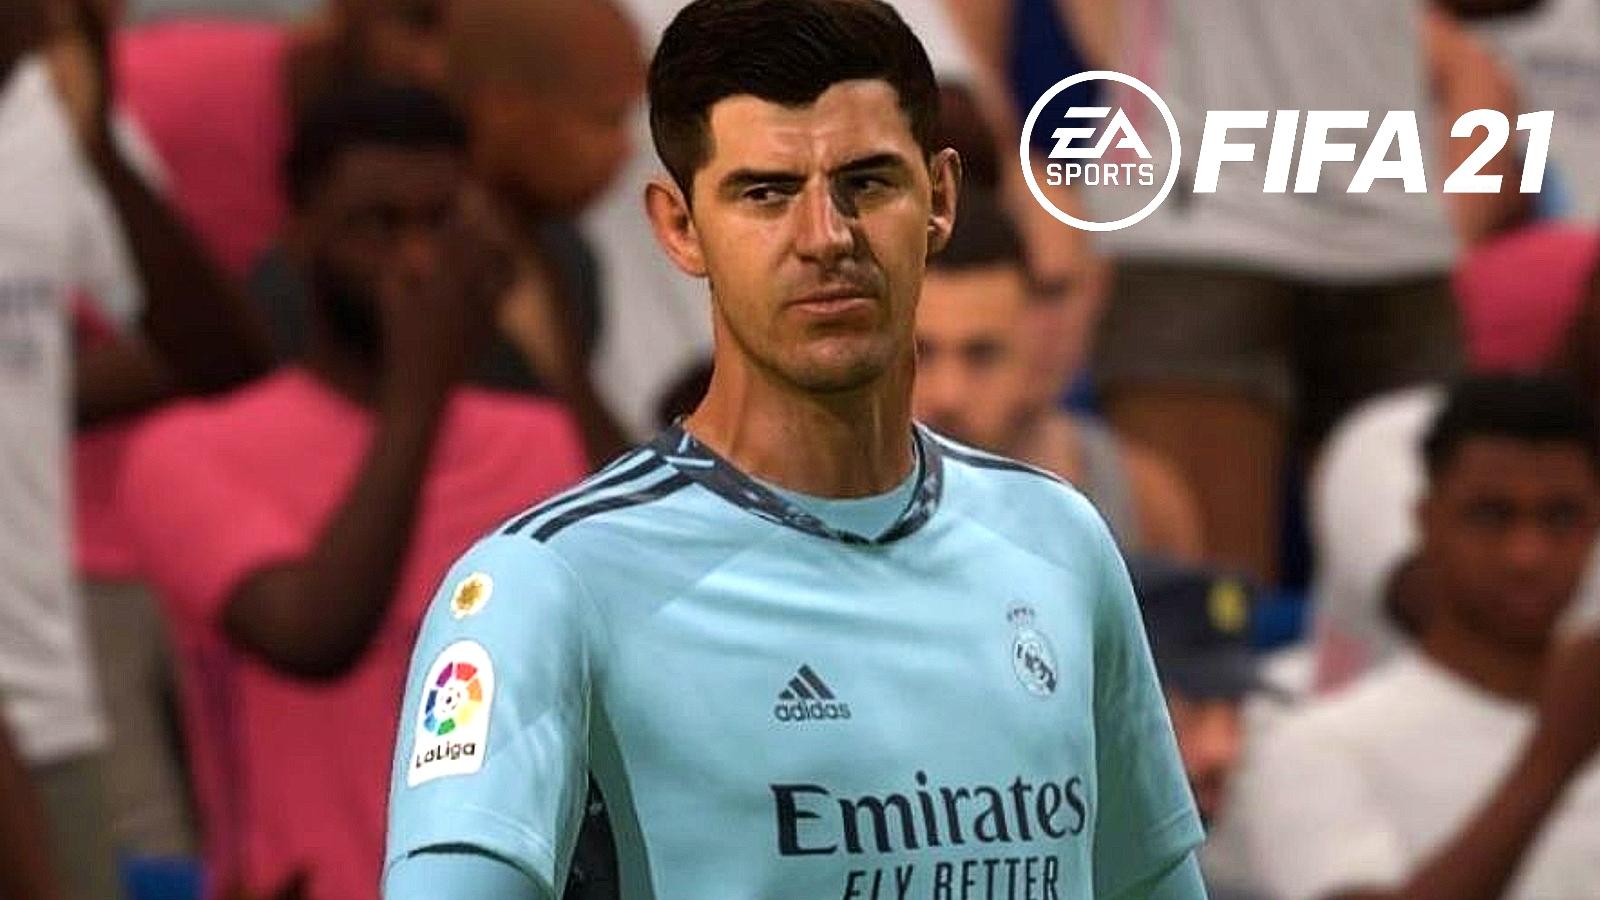 Real Madrid thibaut courtois fifa 21